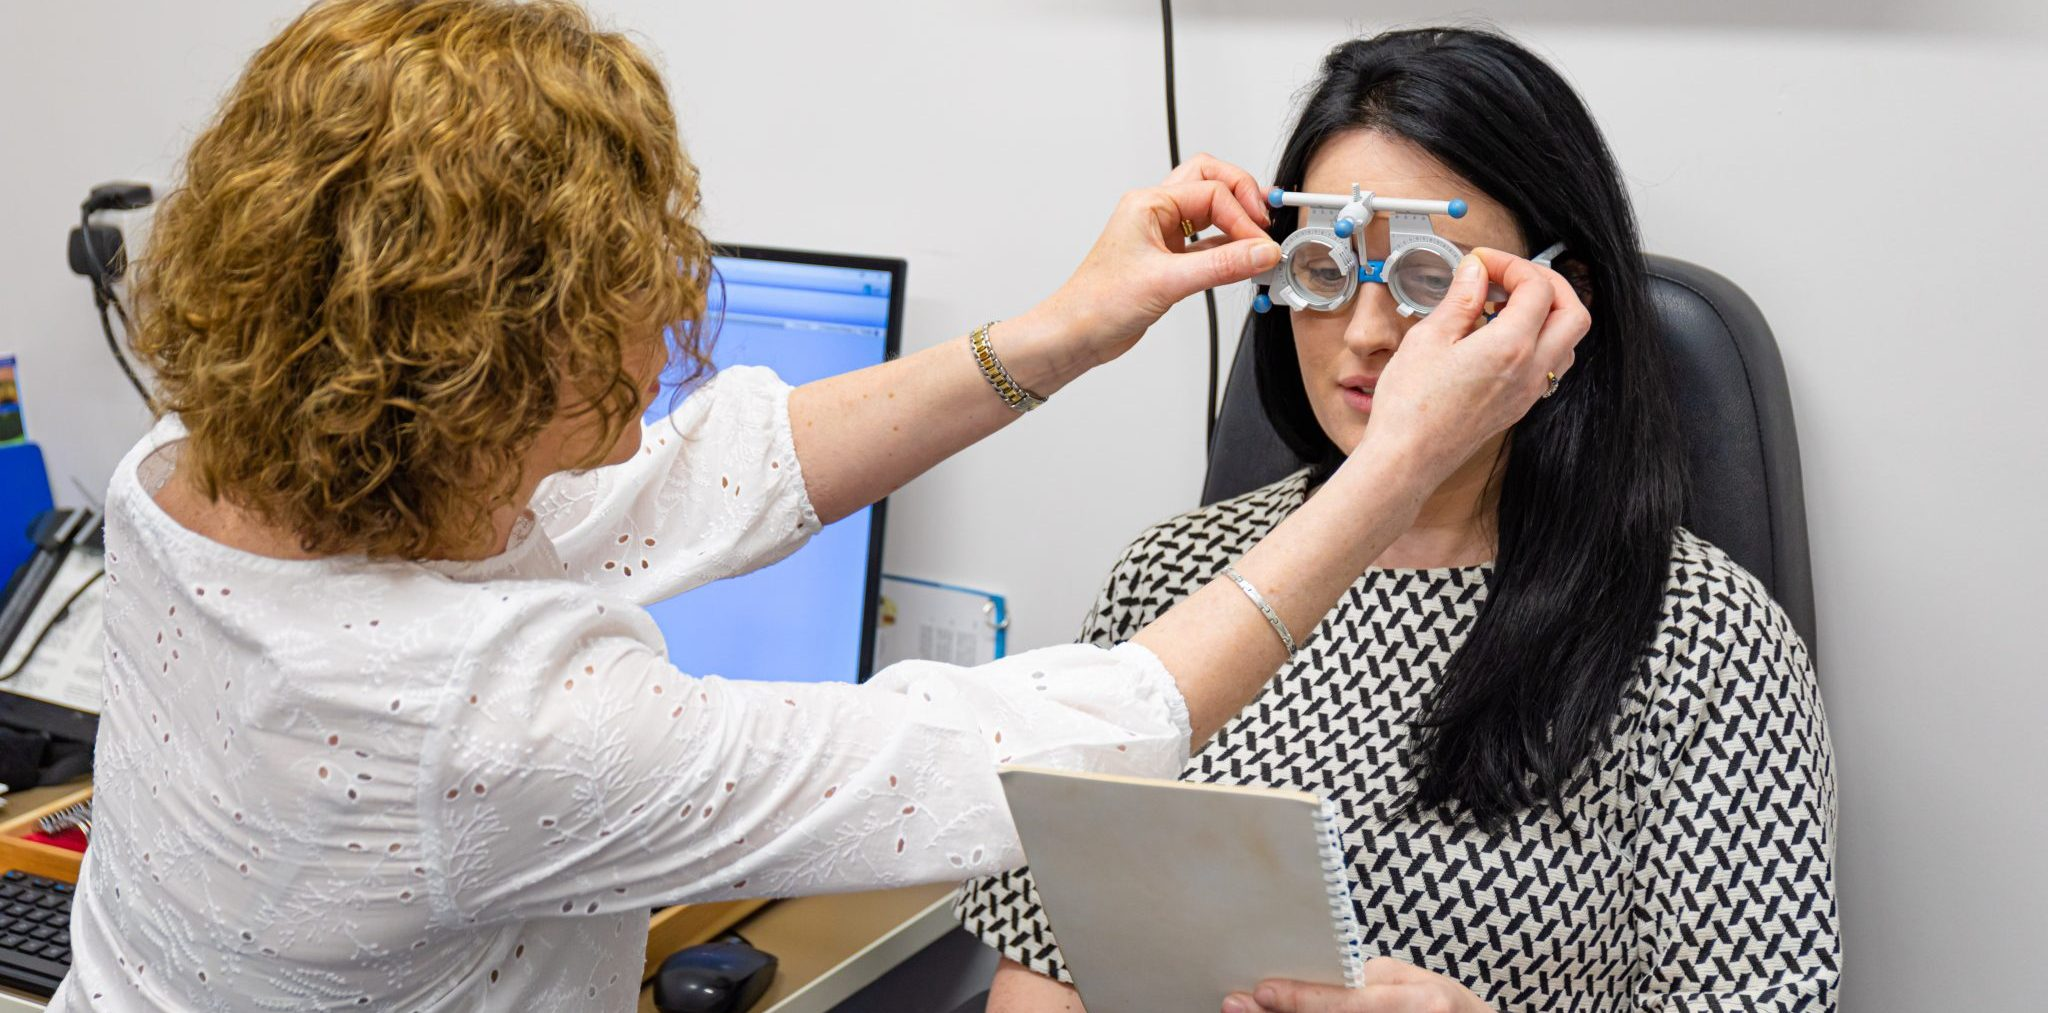 Eye tests using advanced diagnostic equipment